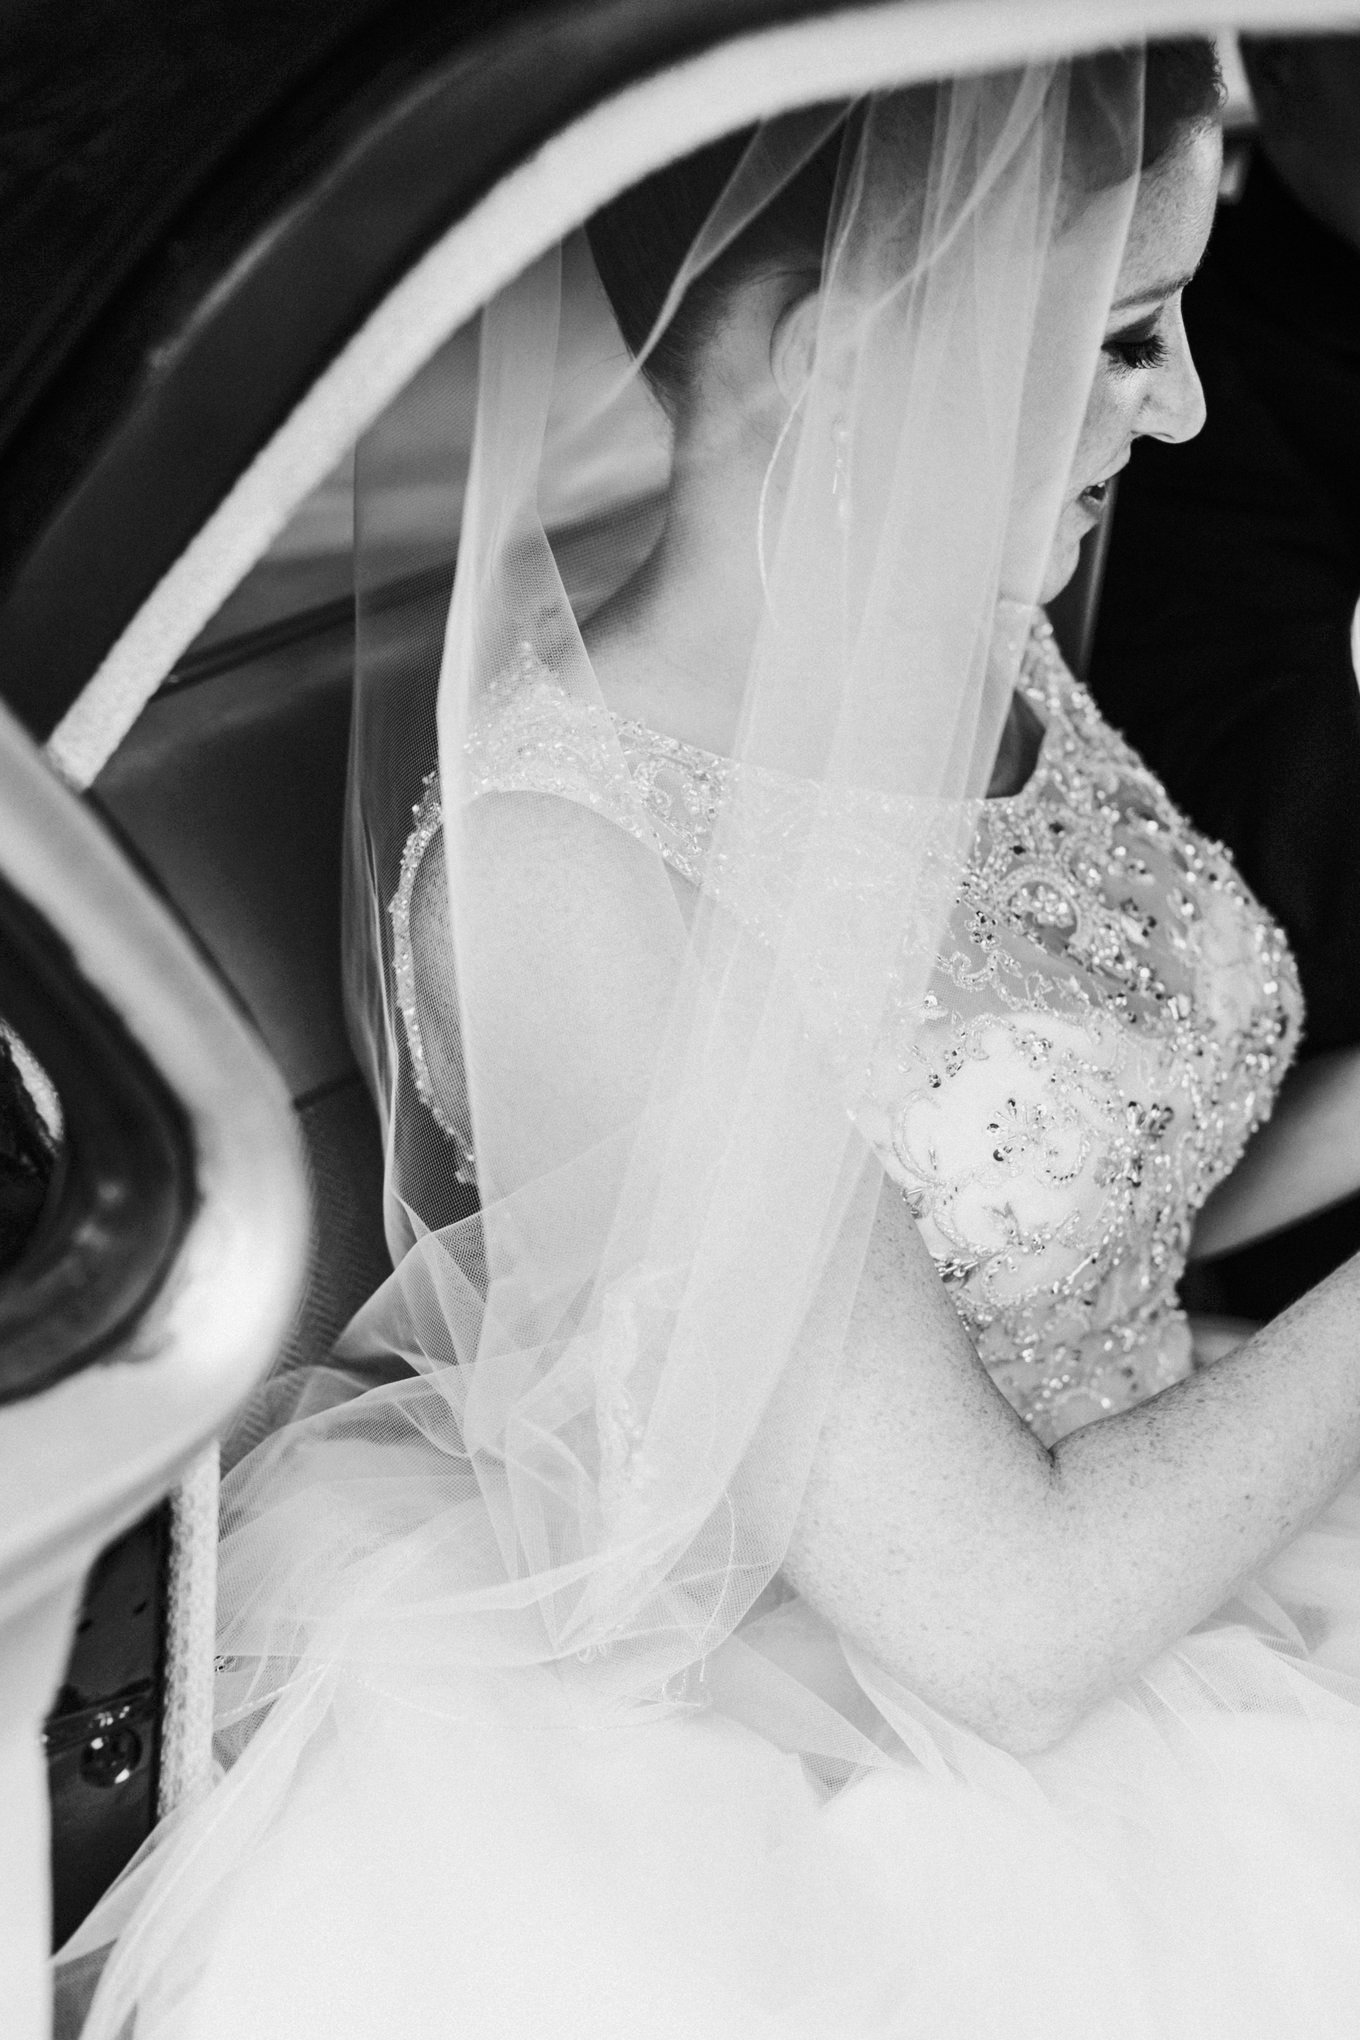 Lena_Mirisola_2017_Weddings_-006.jpg